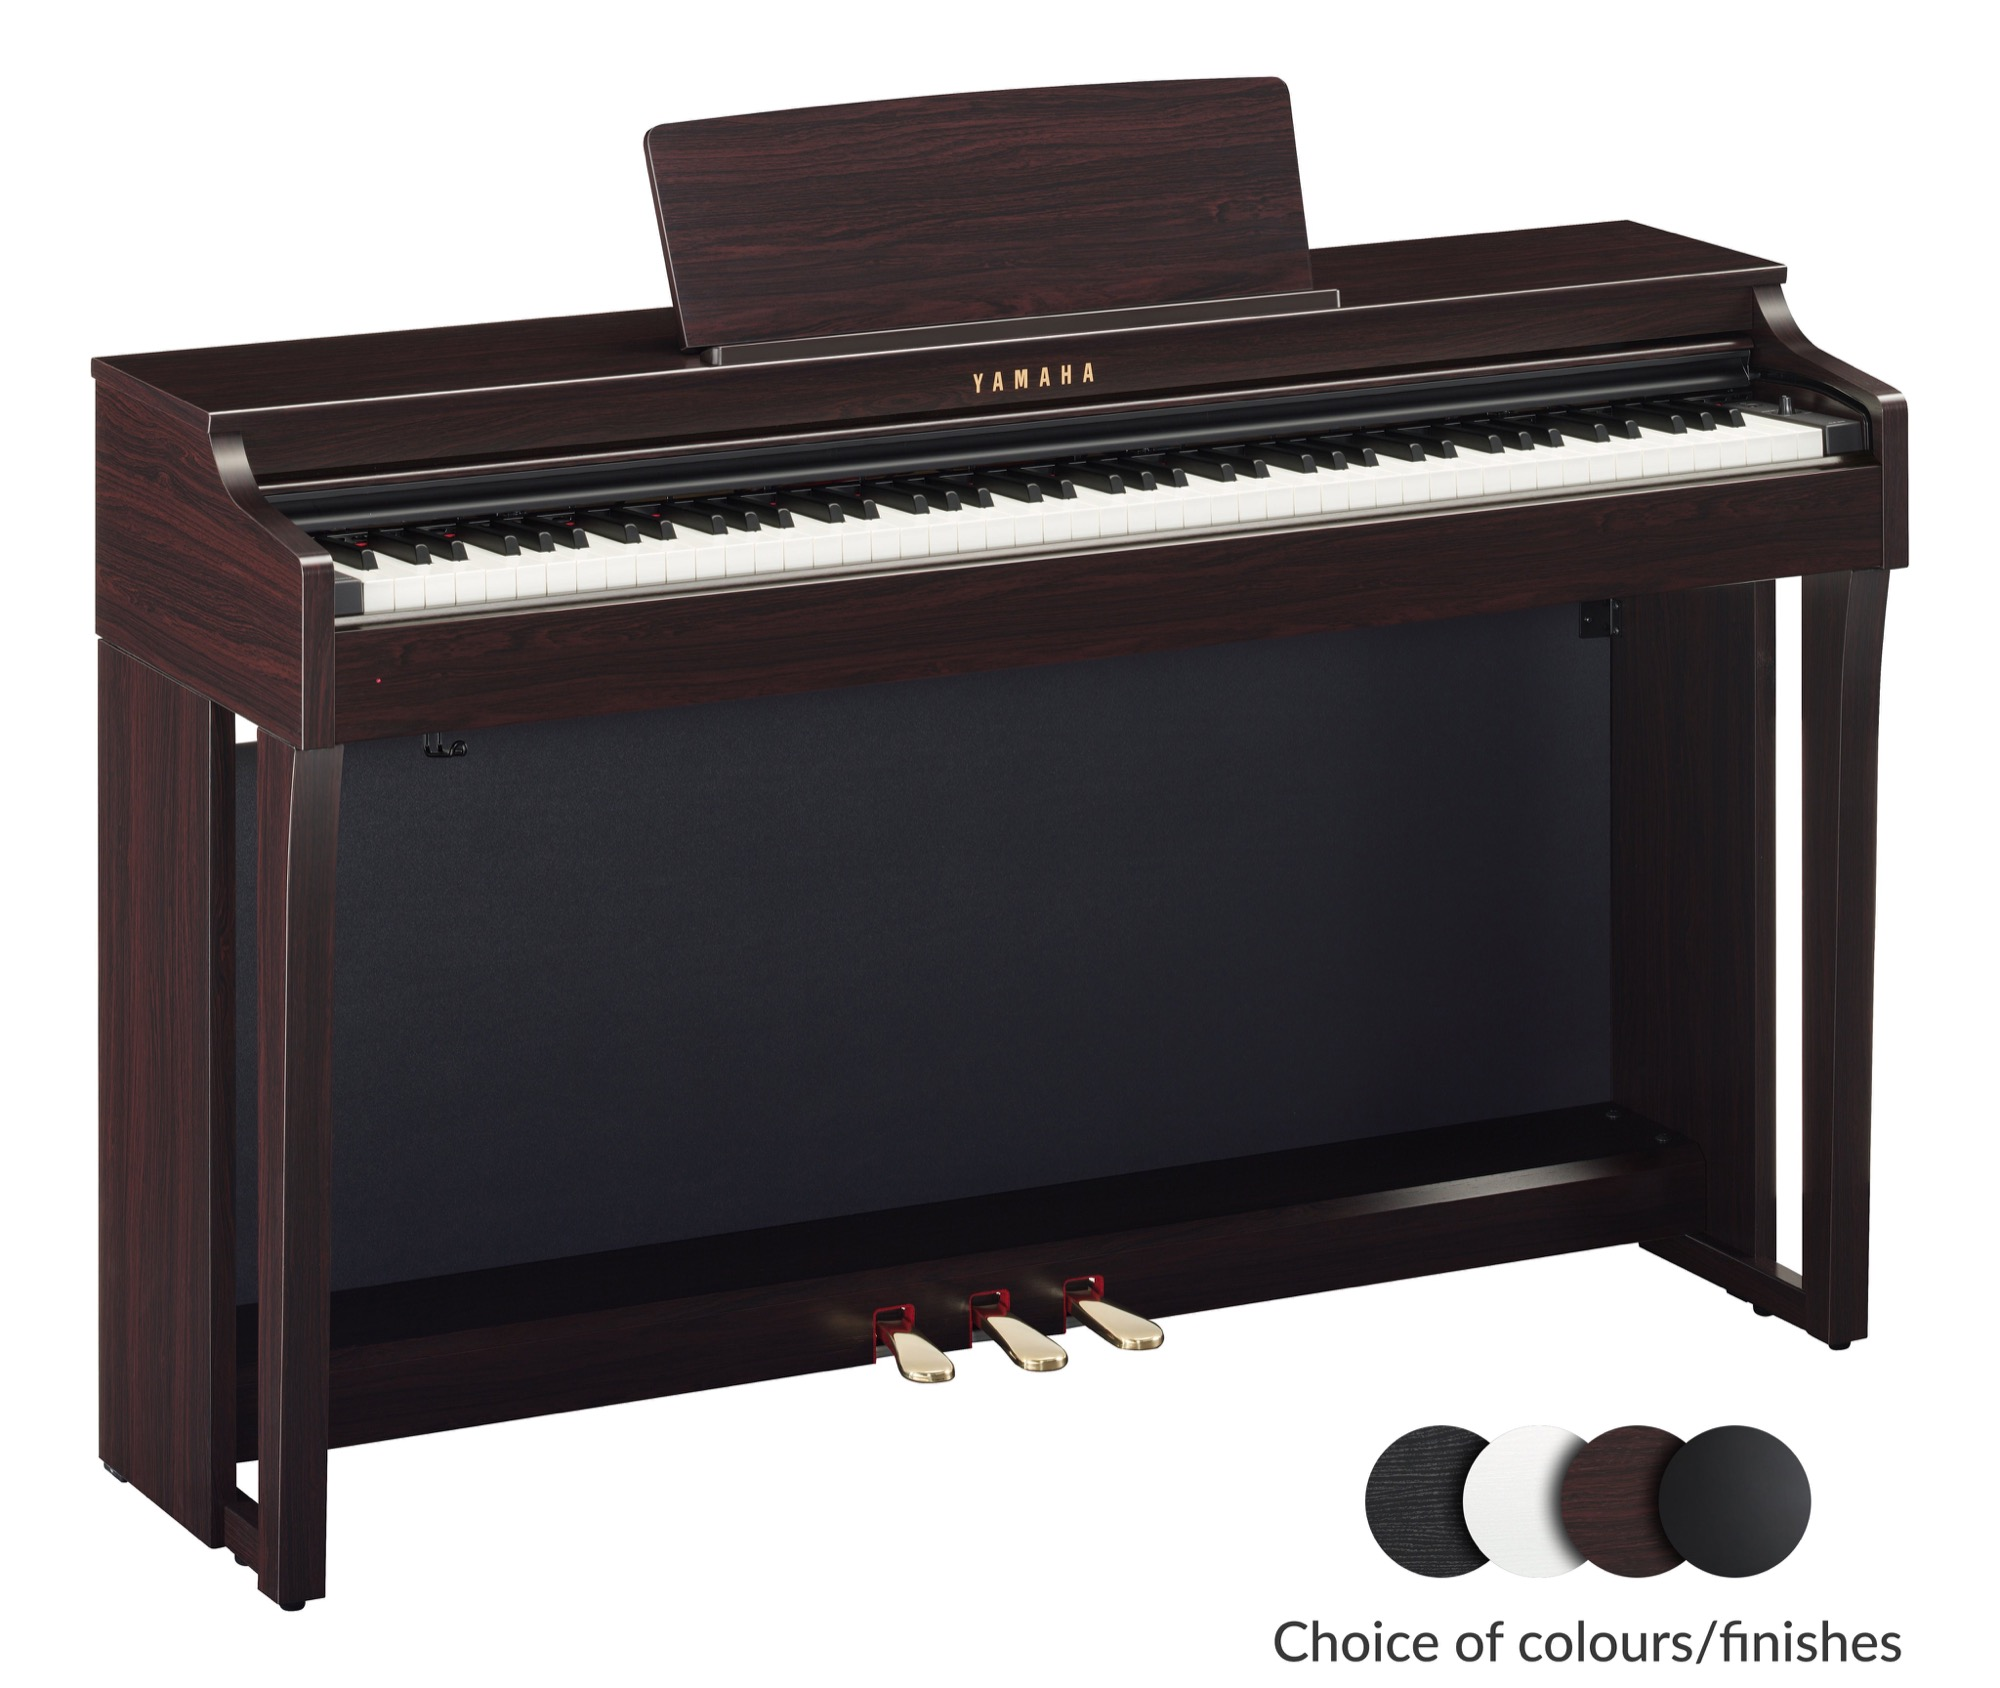 Yamaha clp 625 clavinova digital piano different finishes for Yamaha clp 625